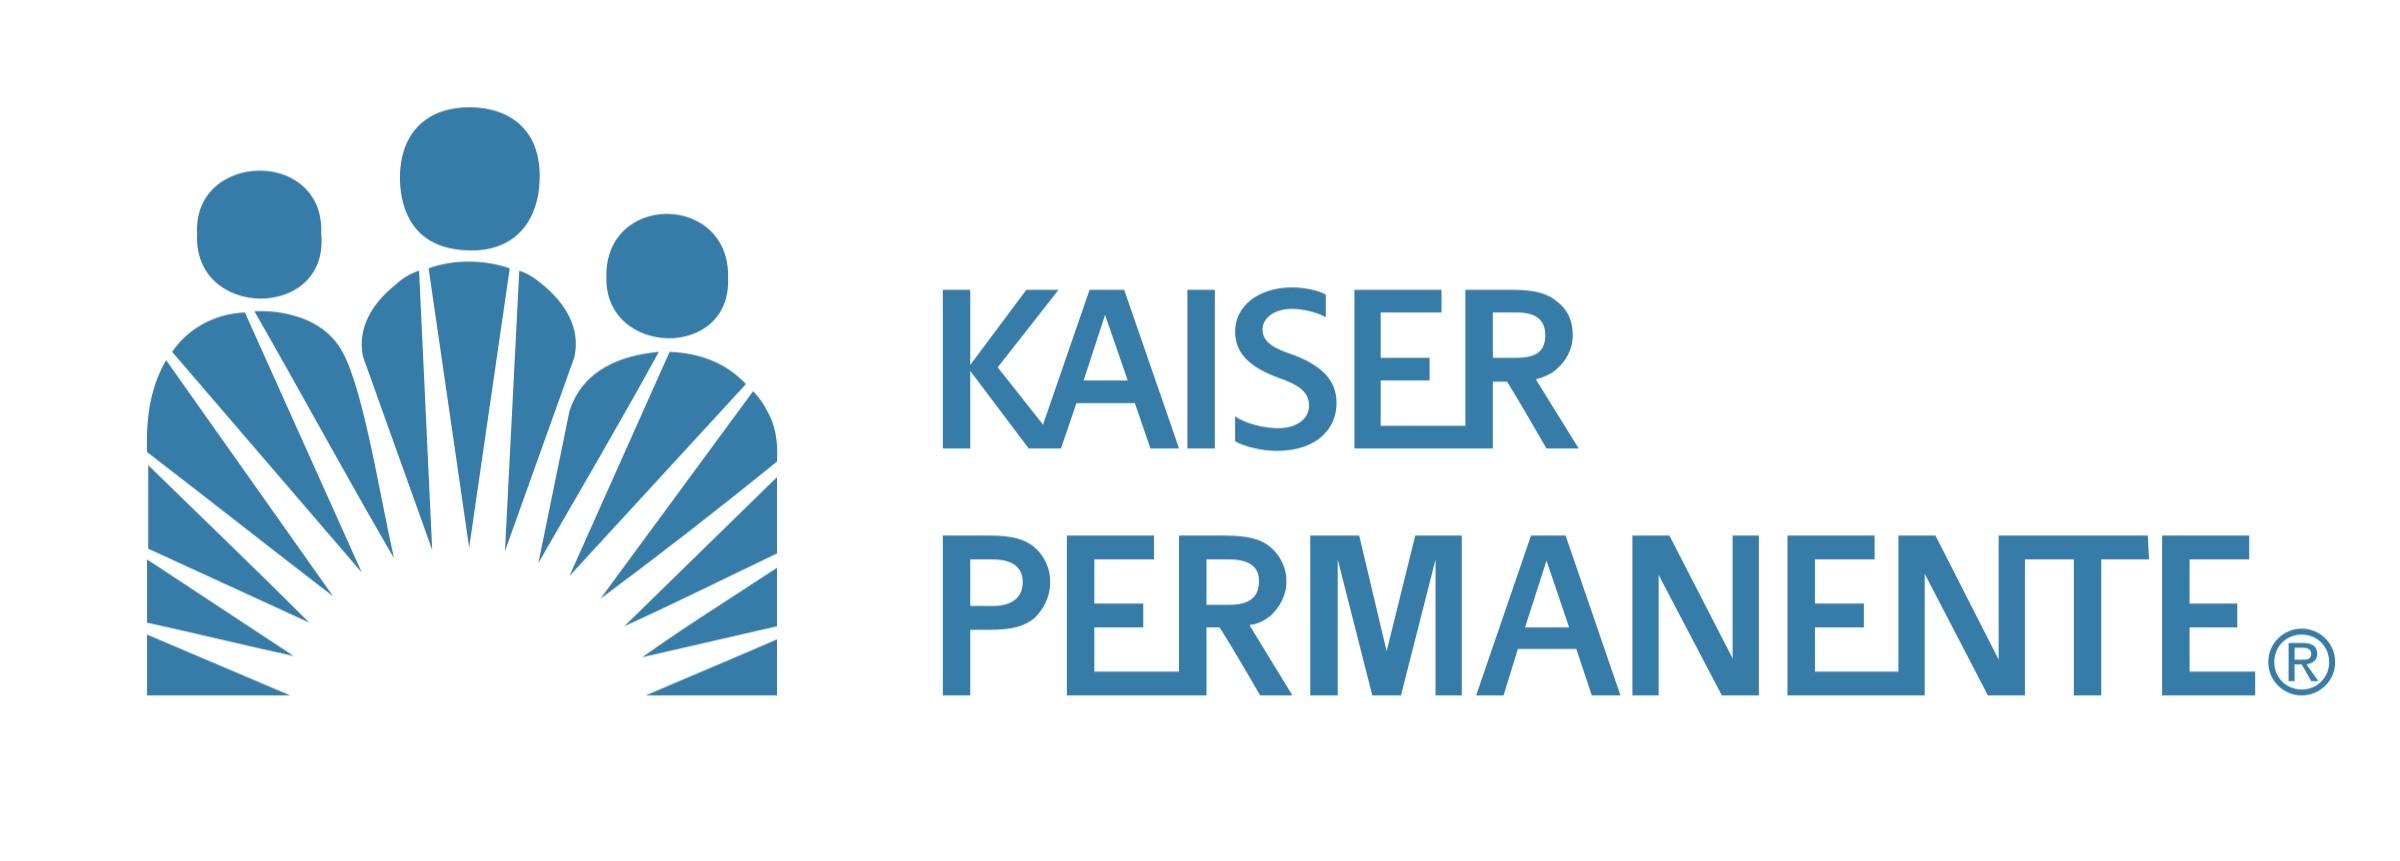 kaiser-permanente-logo-png-transparent.jpg